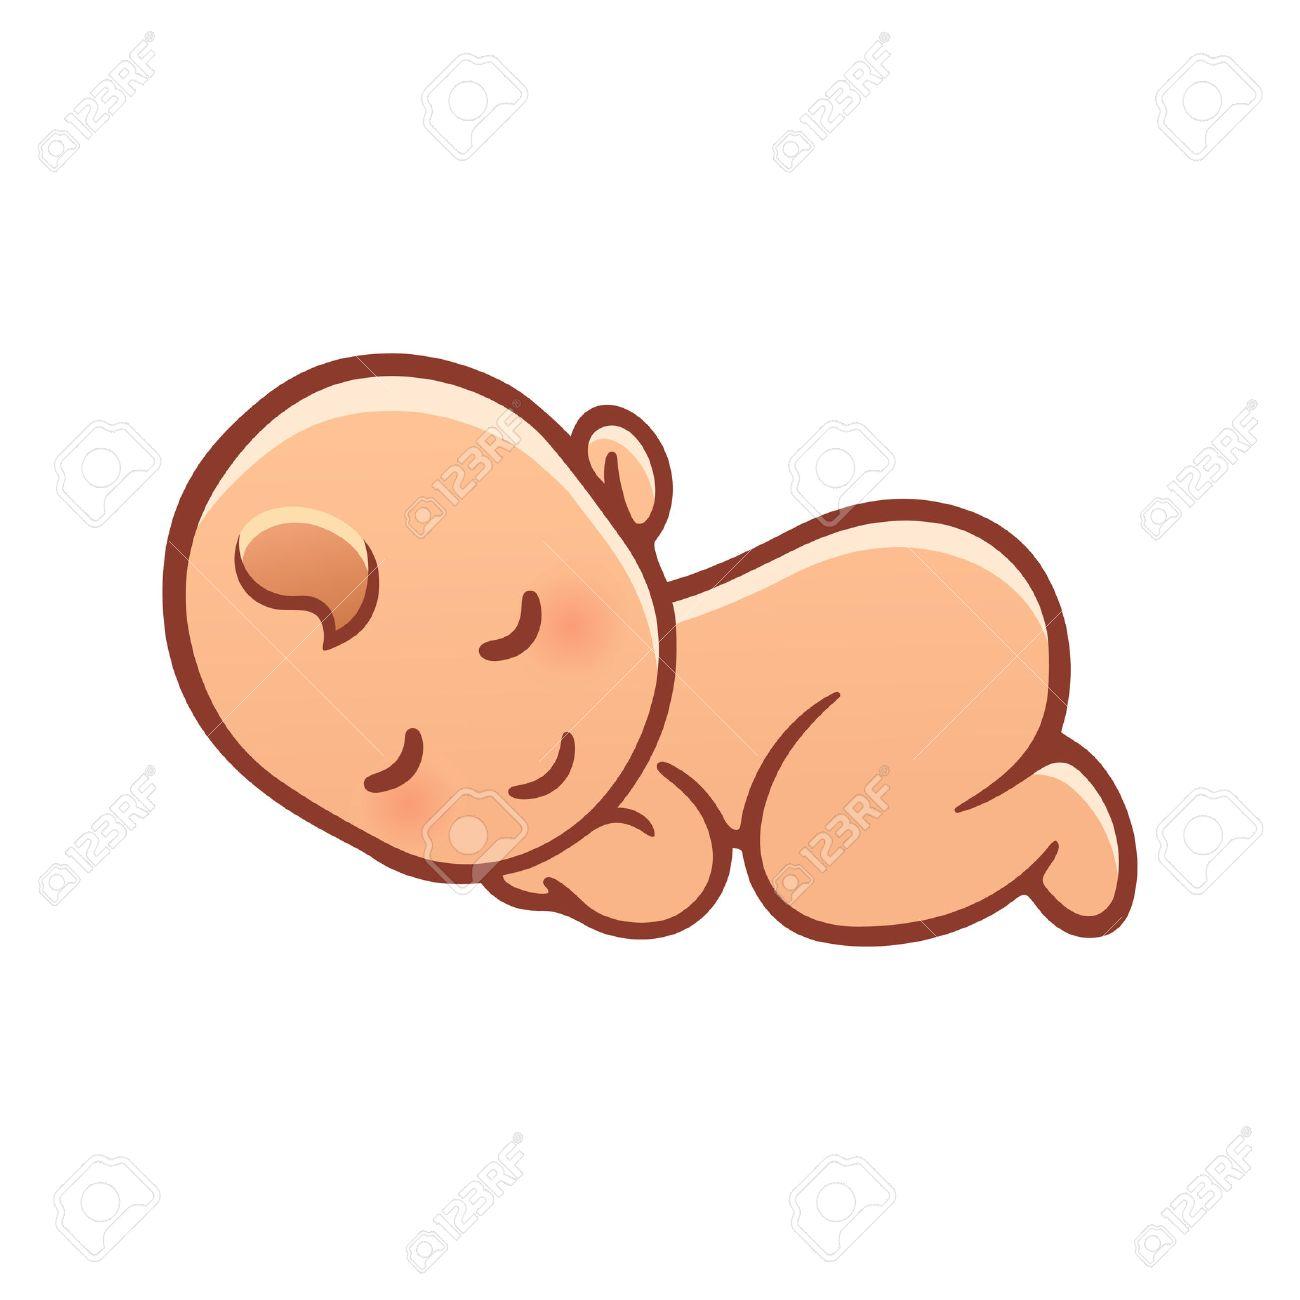 1300x1300 Cute Sleeping Baby Drawing. Simple Cartoon Vector Illustration